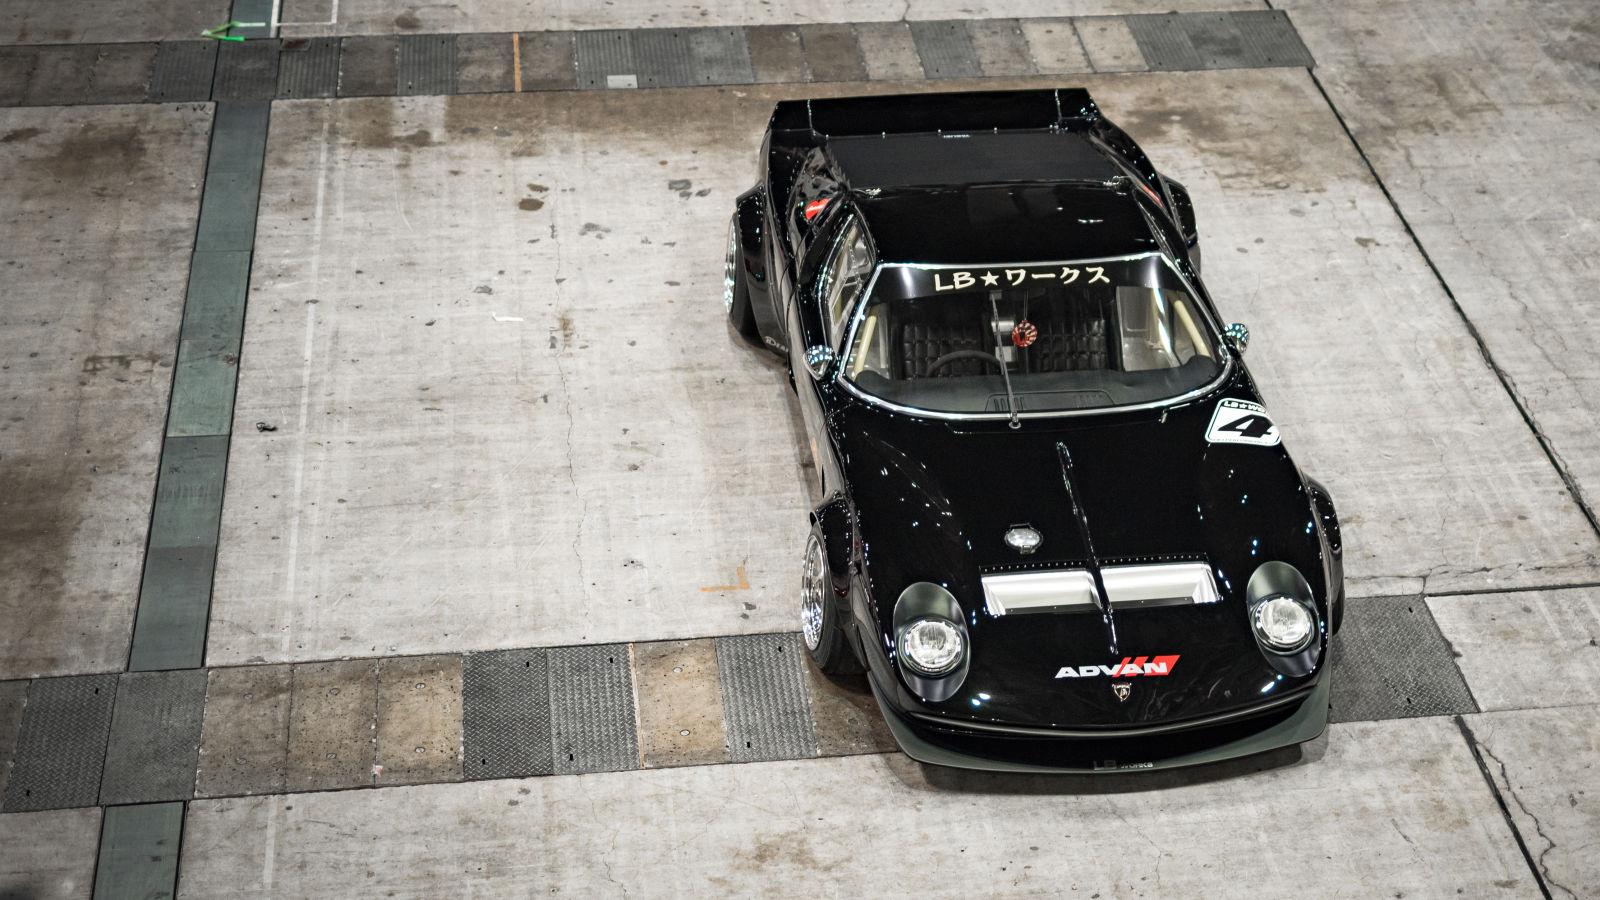 Liberty Walk lamborghini miura Wataru Shakotan Koyaji Kato rabaissée low GT40